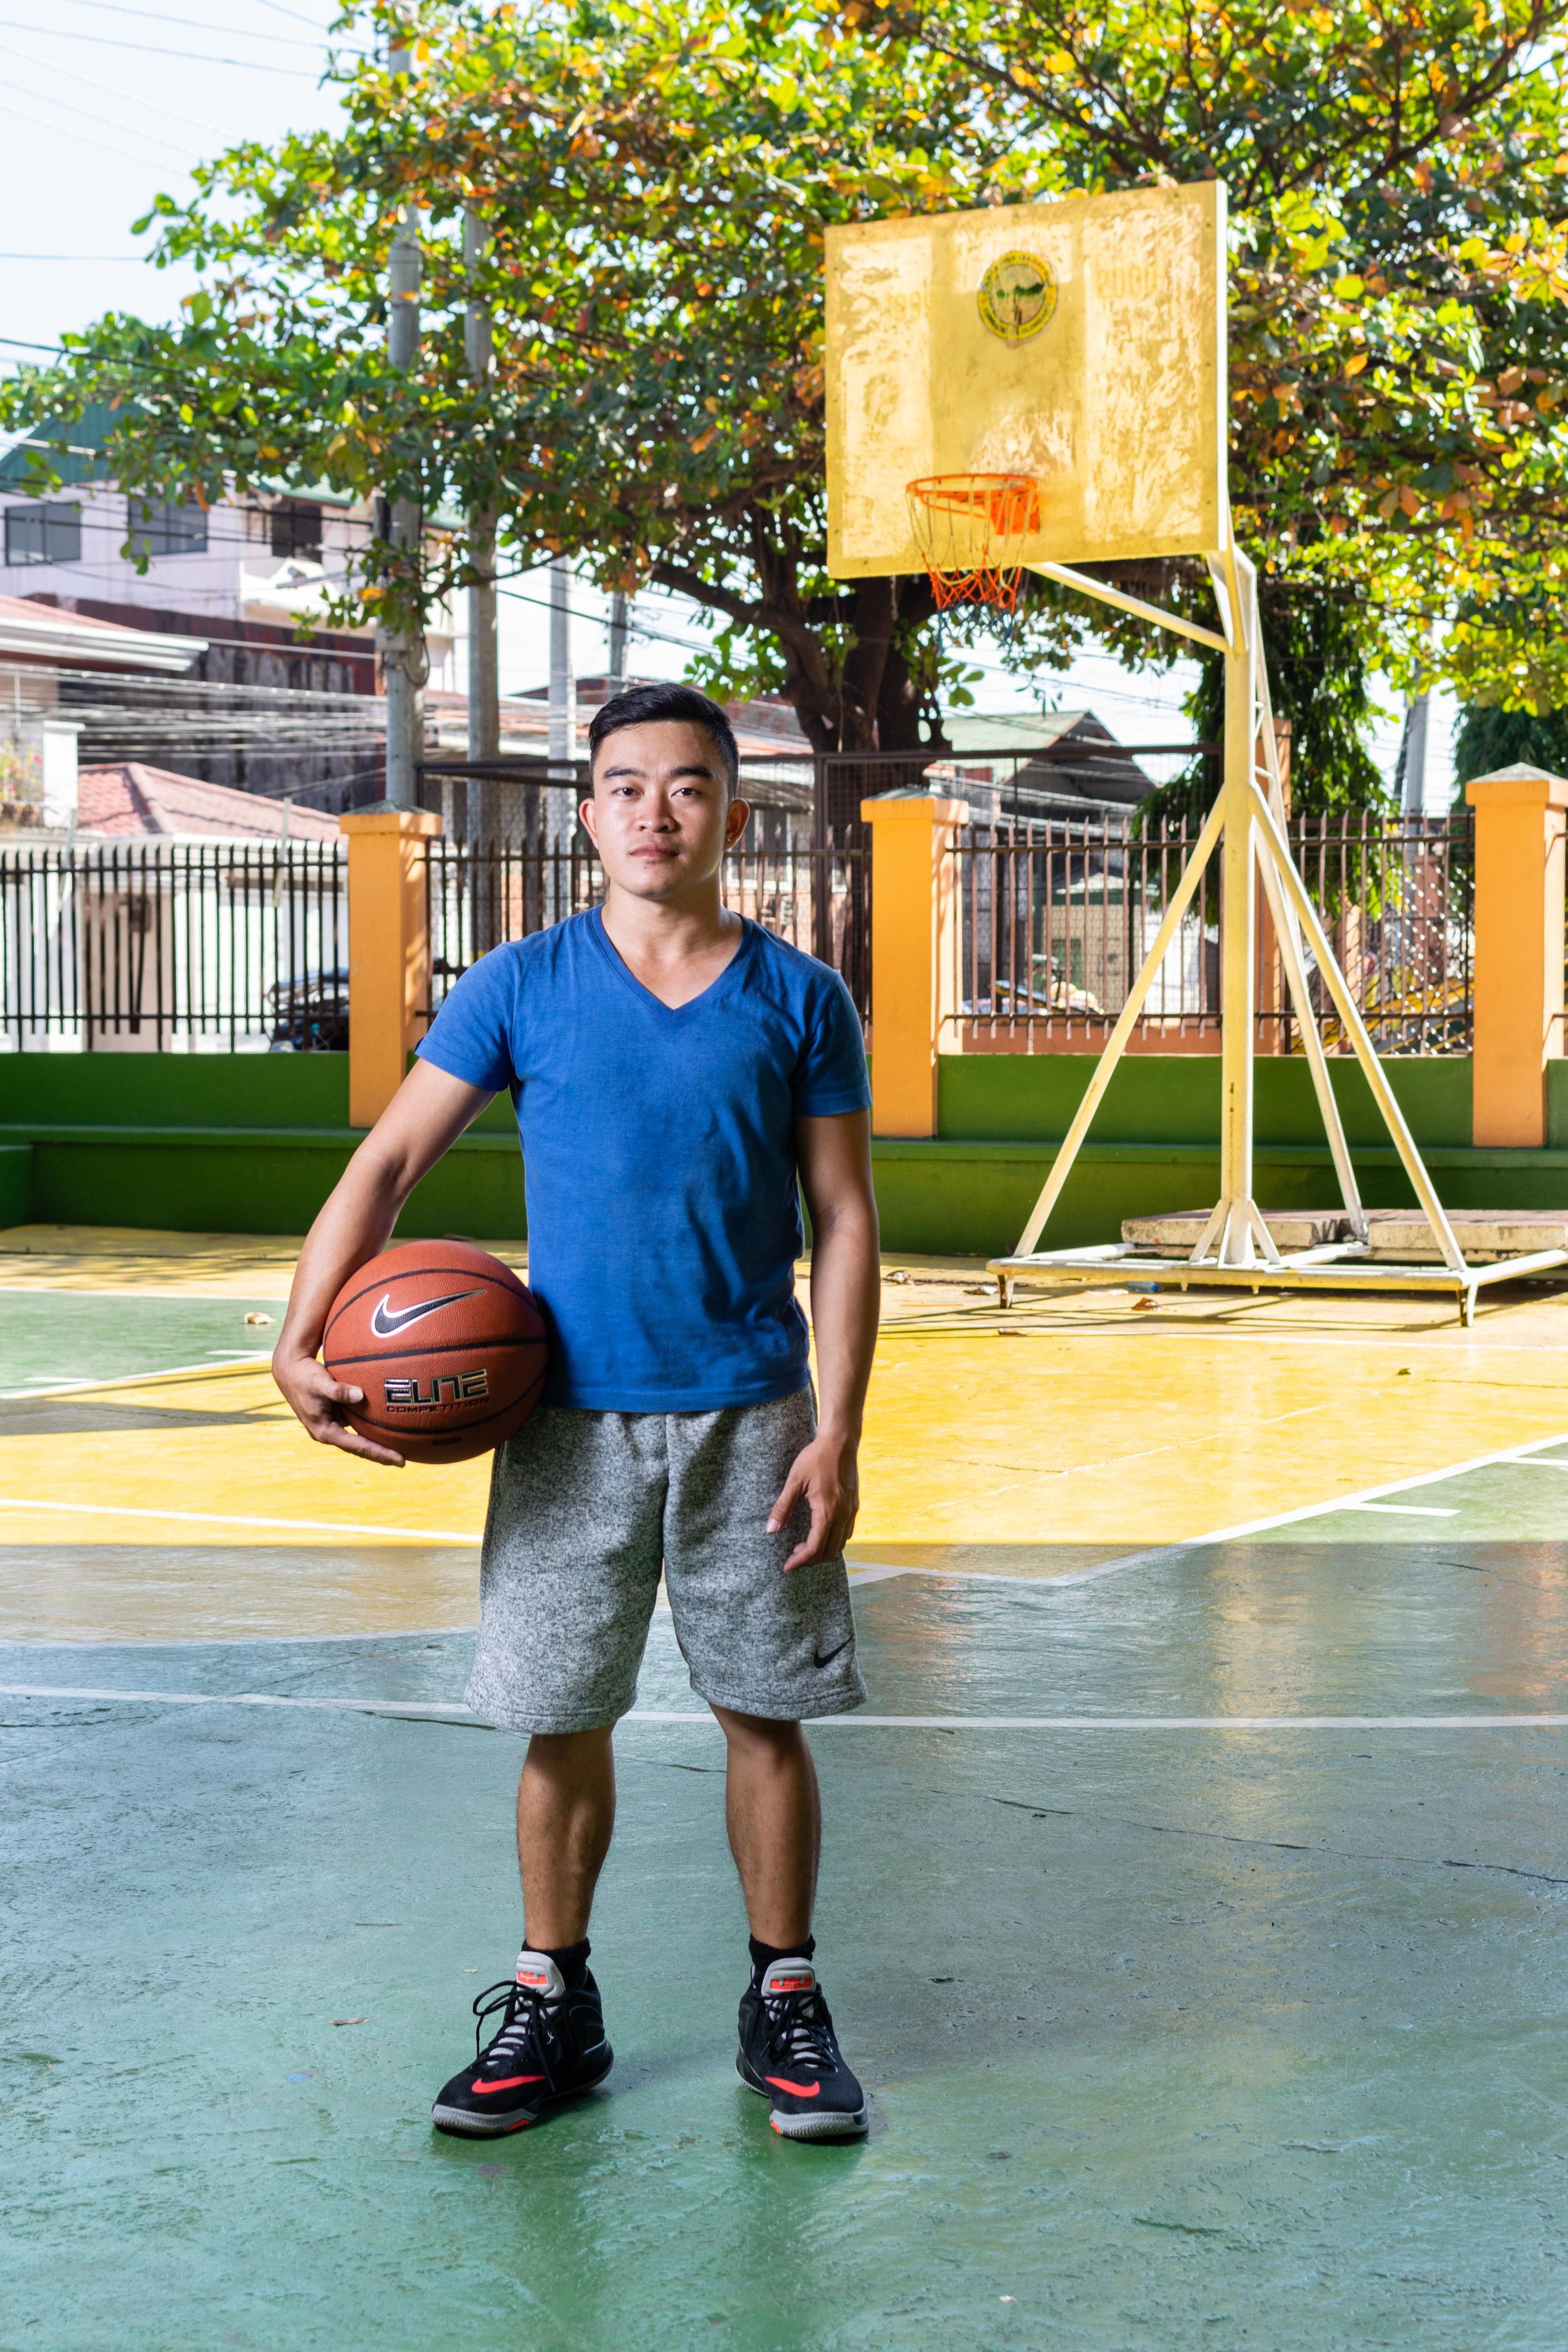 190303_basketball_portrait-2.jpg